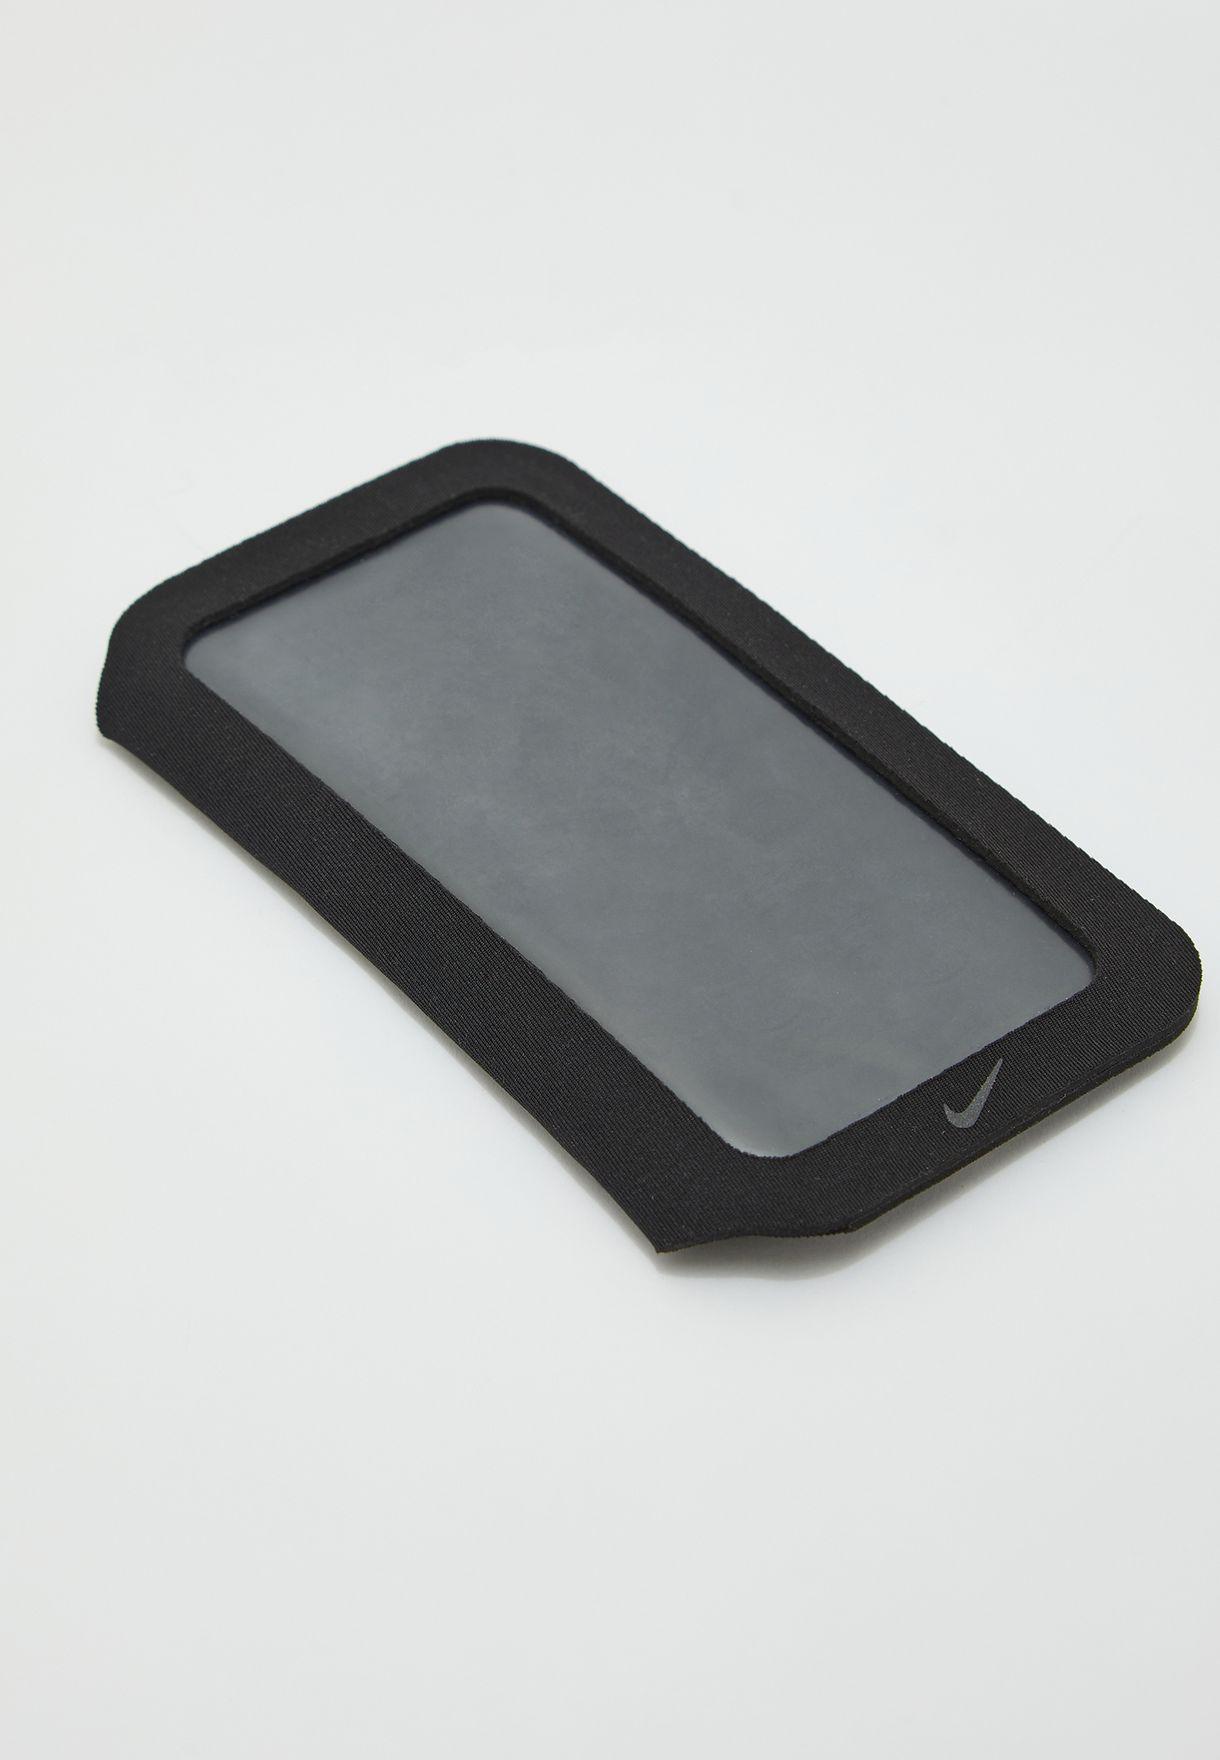 مقبض هاتف بلس 2.0